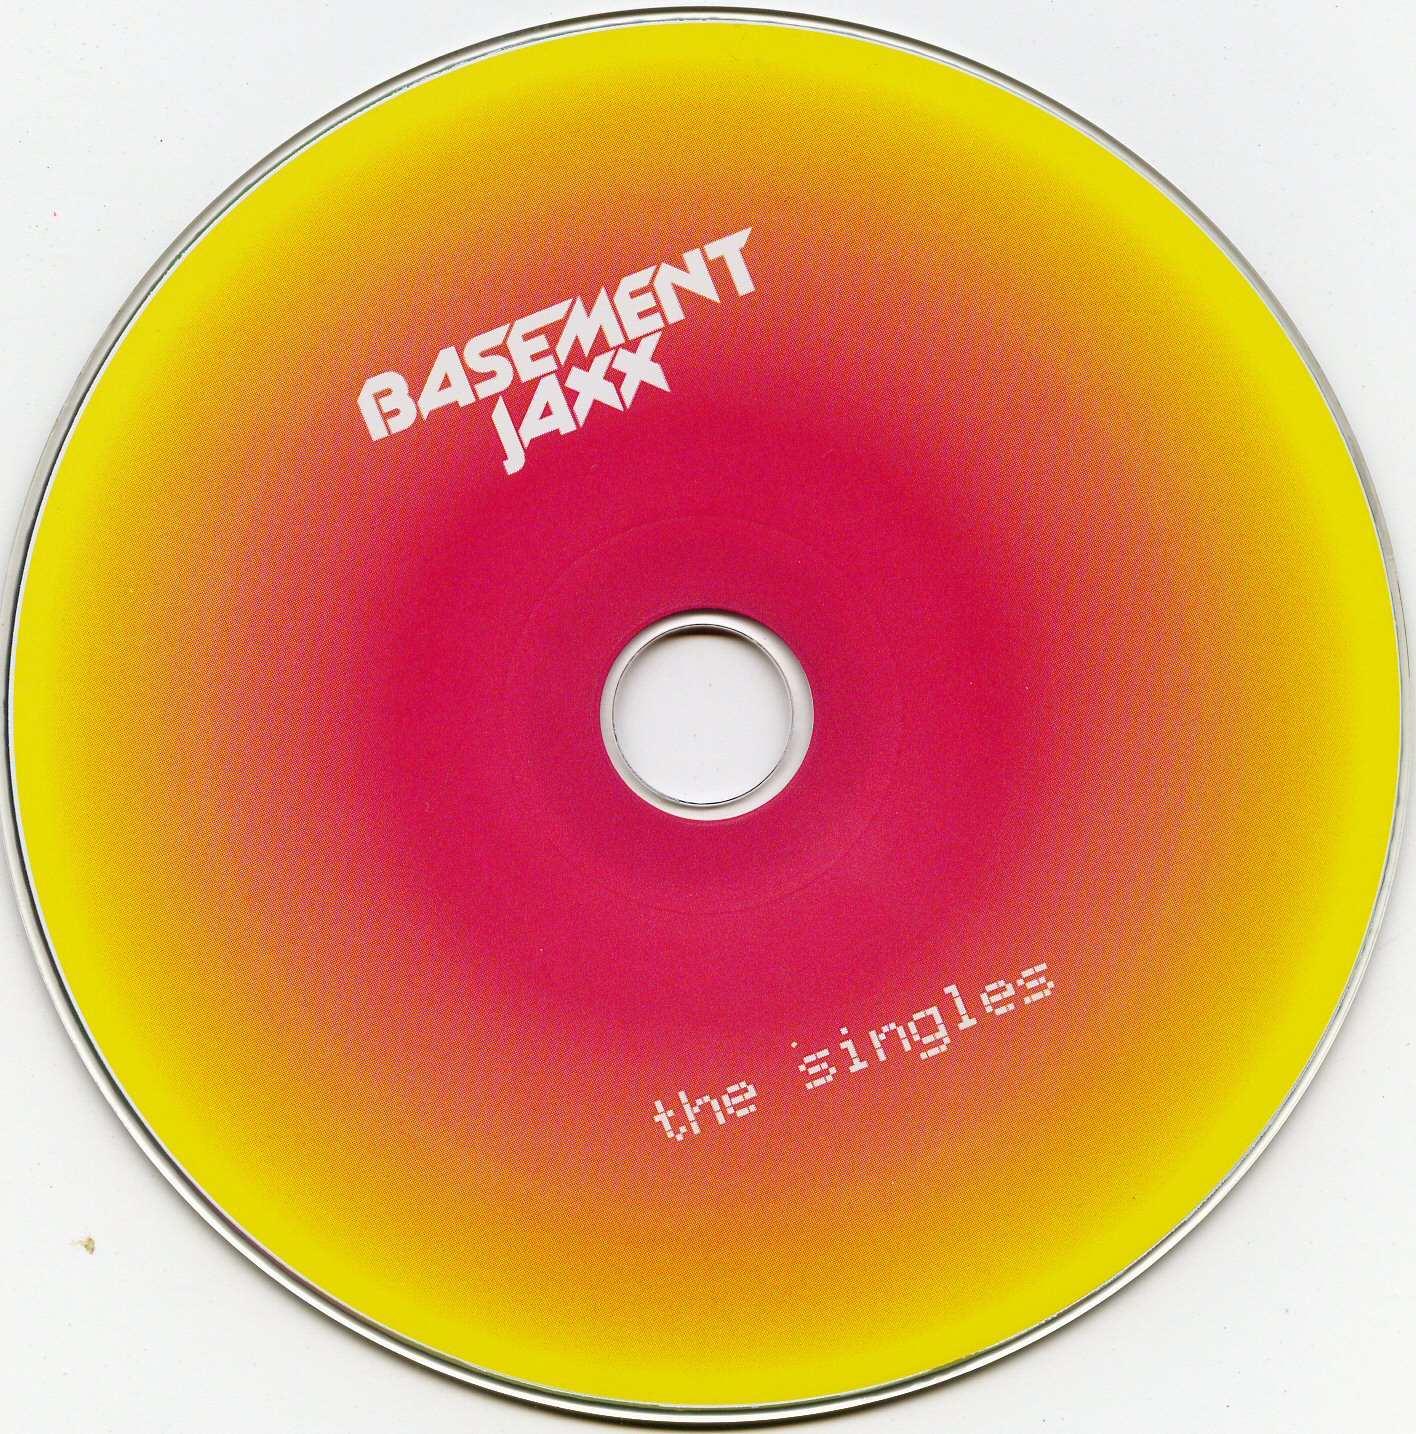 cd basement jaxx the singles cd scarica la cover cd basement jaxx